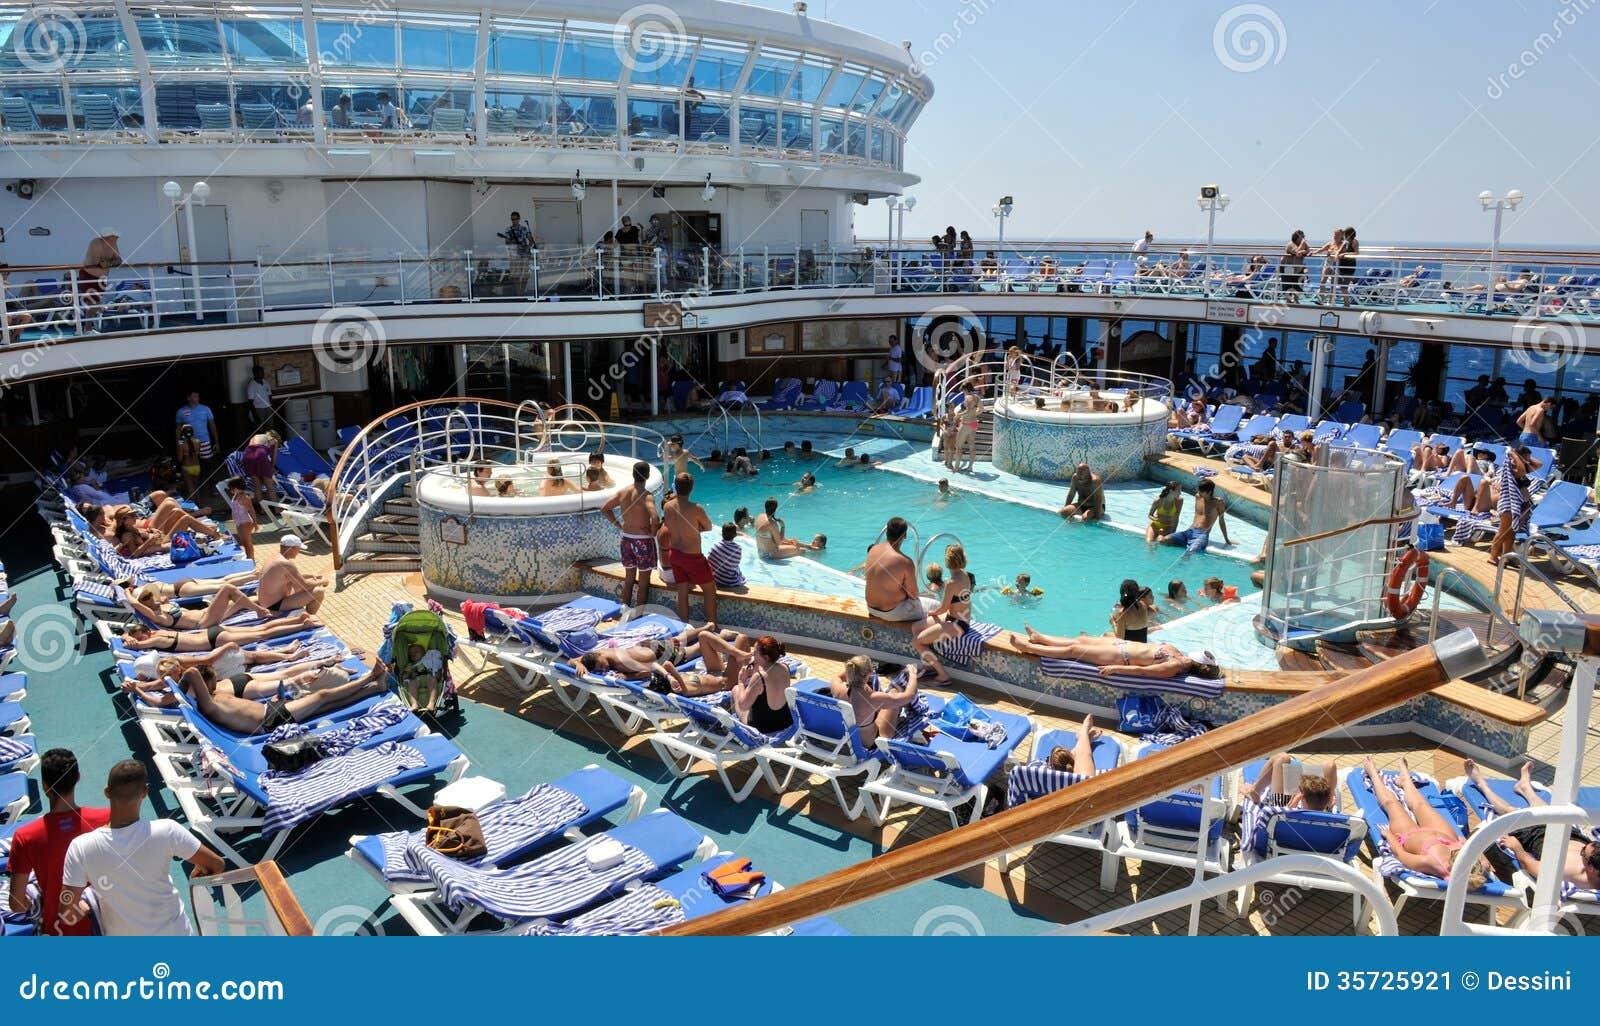 Poolside Cruise Ship Editorial Photo Image 35725921